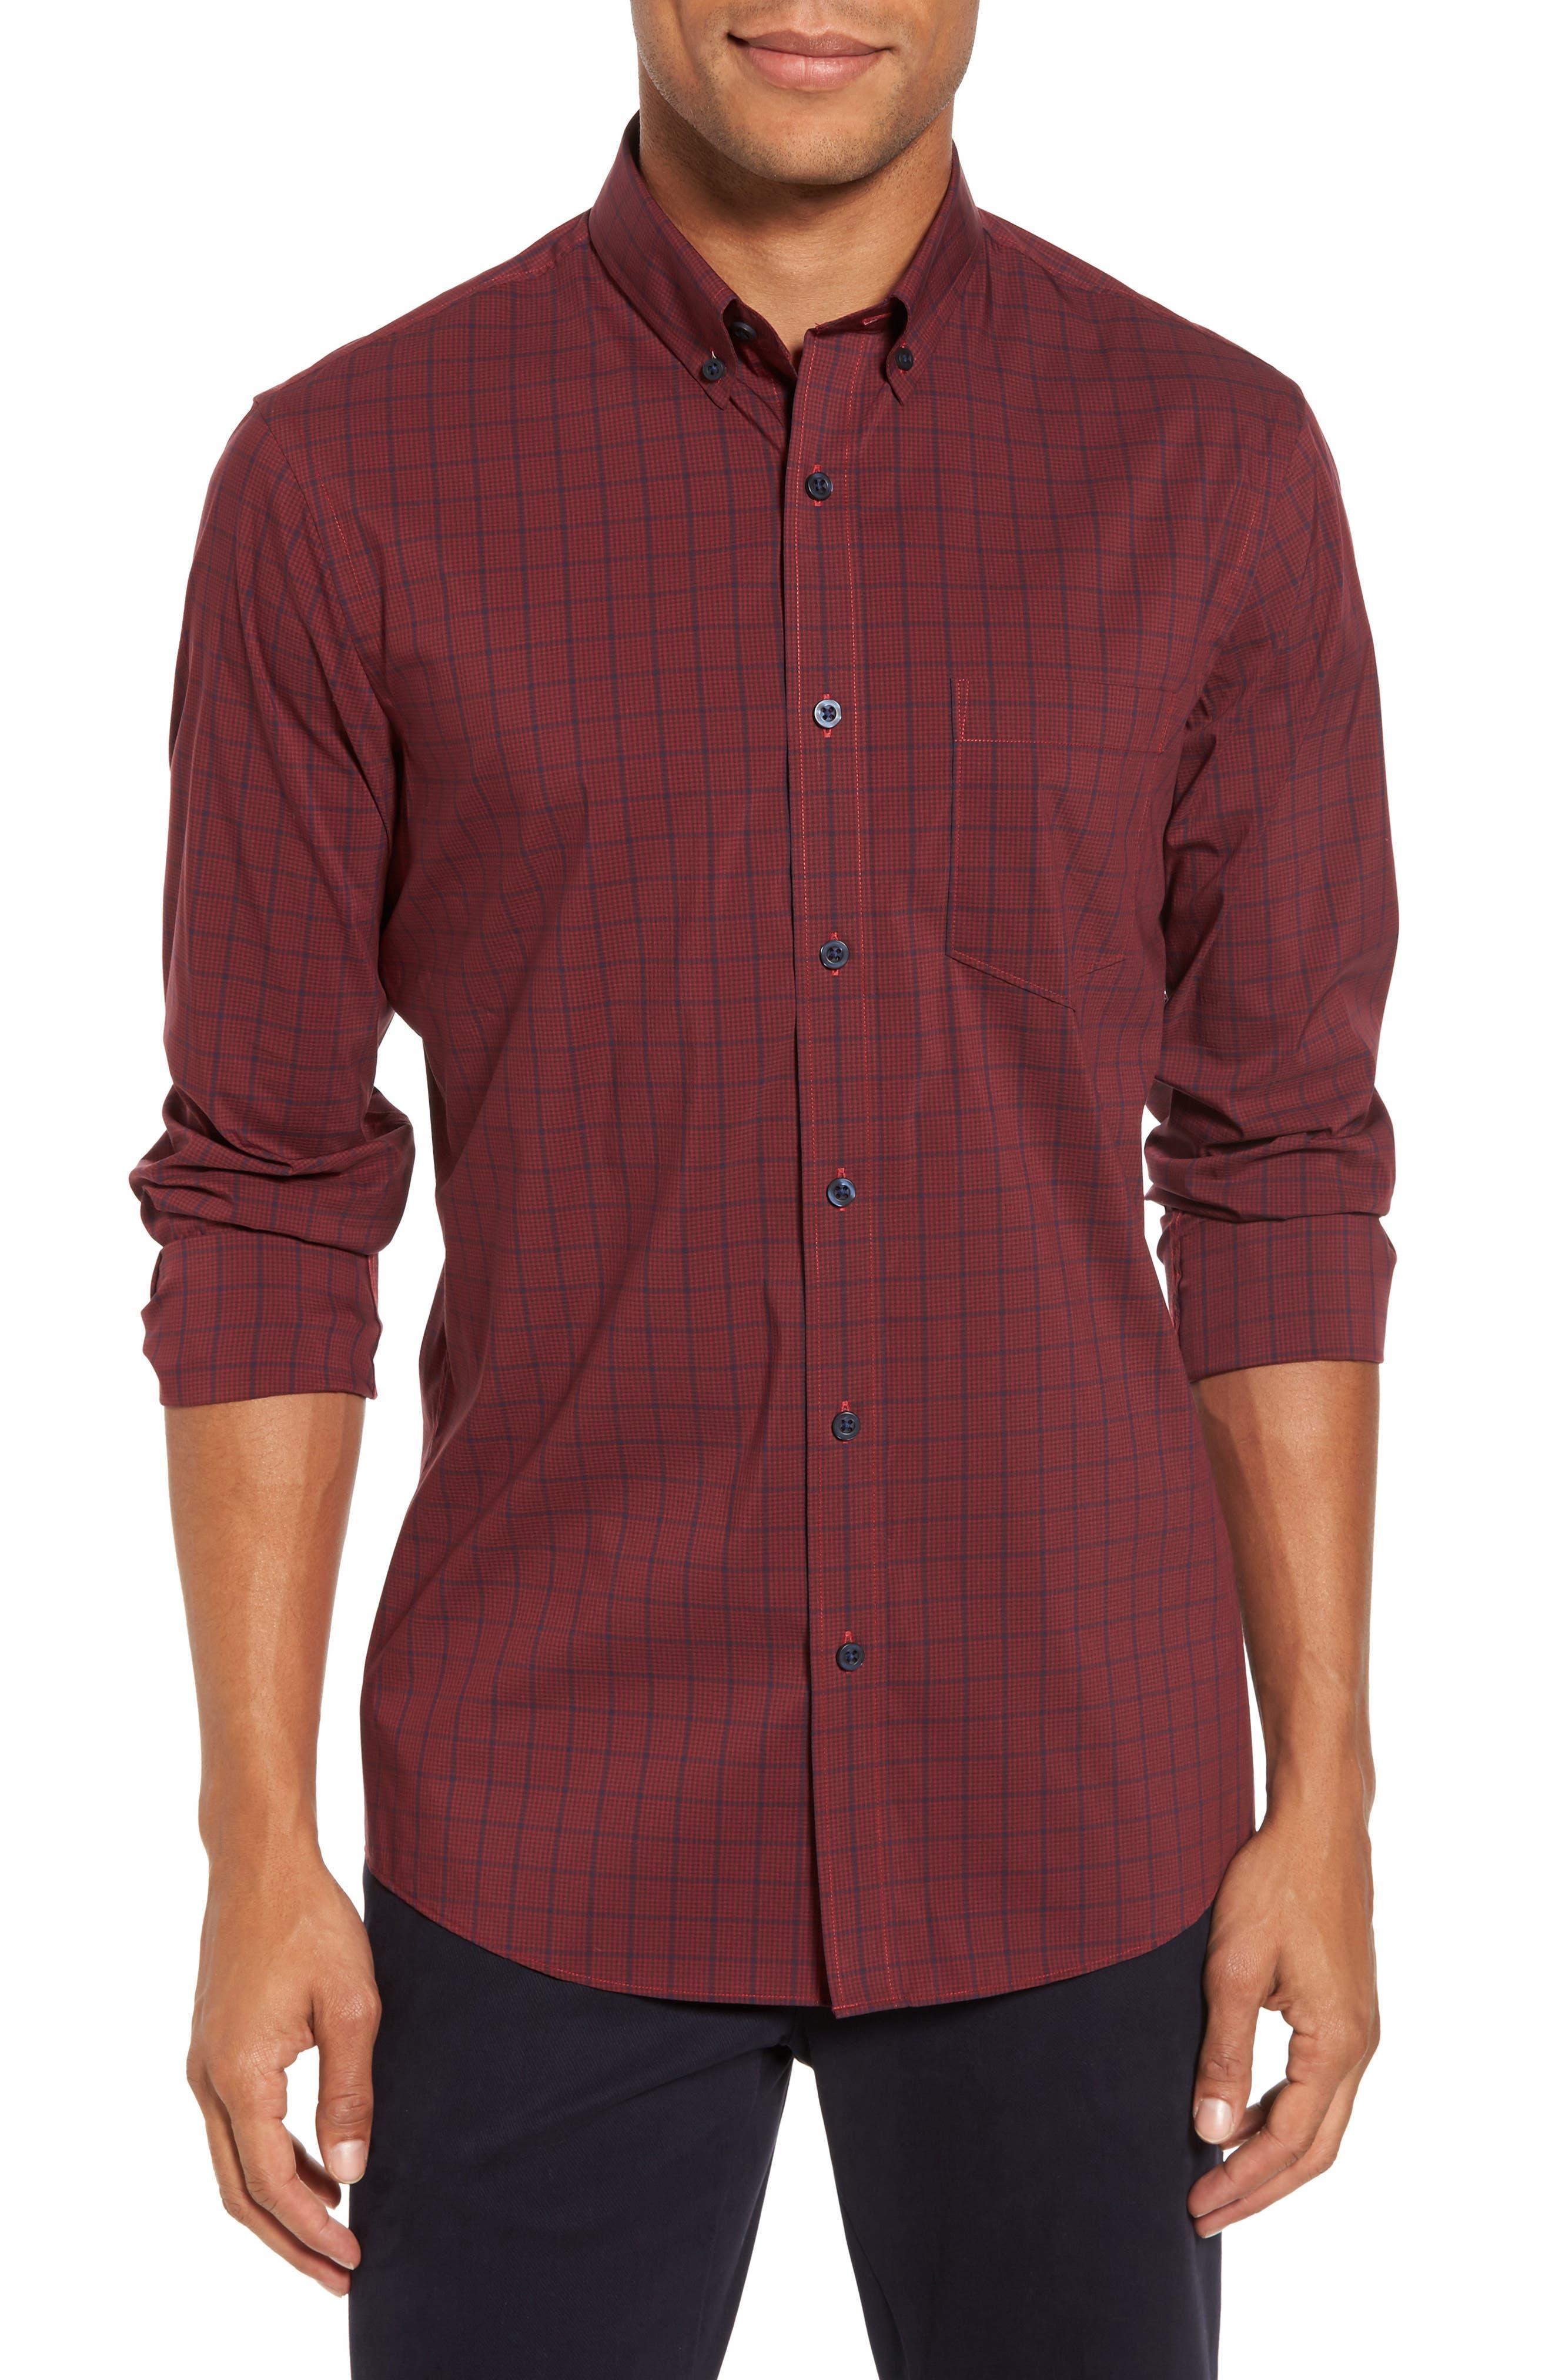 Main Image - Nordstrom Men's Shop Spade Tech-Smart Plaid Sport Shirt